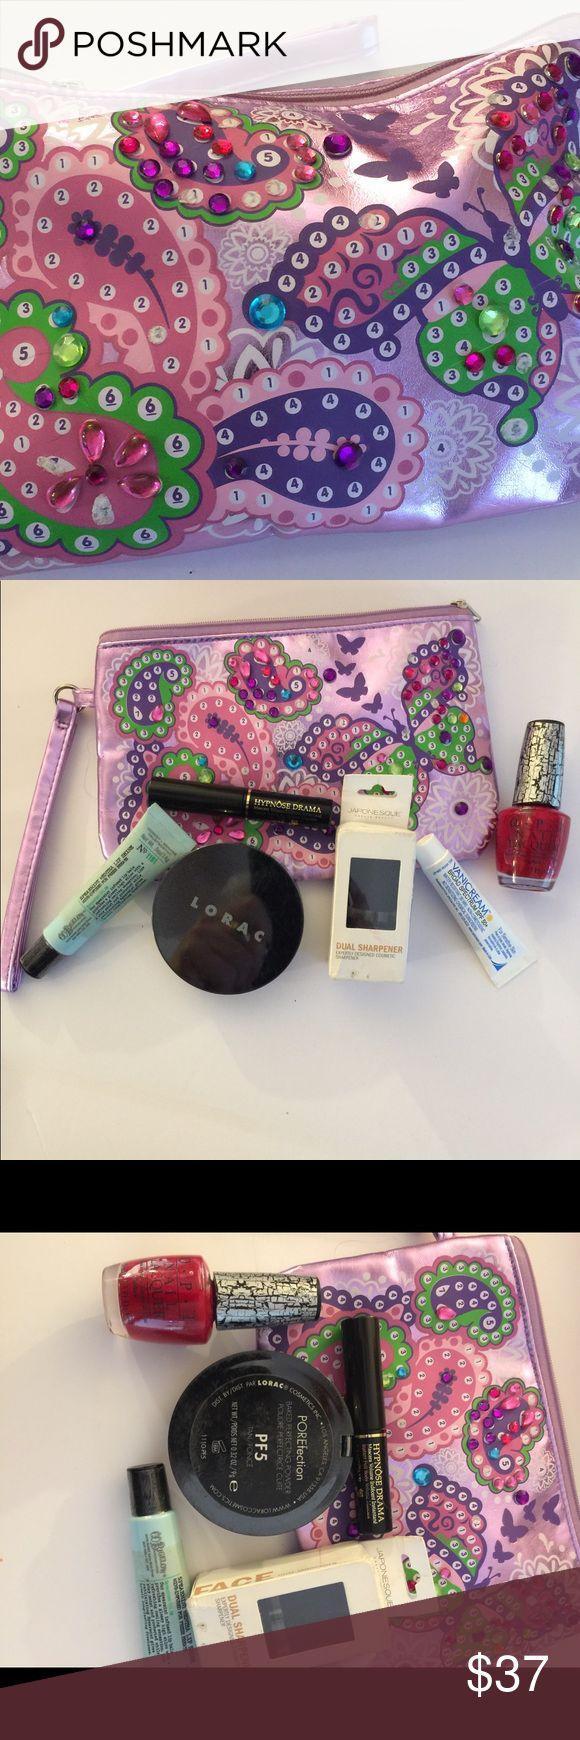 Bargain bundle make up bag filled! Bigelow spearmint lip shine, Lorac porfection Pfs, (used slightly :not my shade ),Japonesque dual sharpener,OPI red crackle polish,vanicreme,Lancôme Hypnos Drama black mascara ... many Makeup